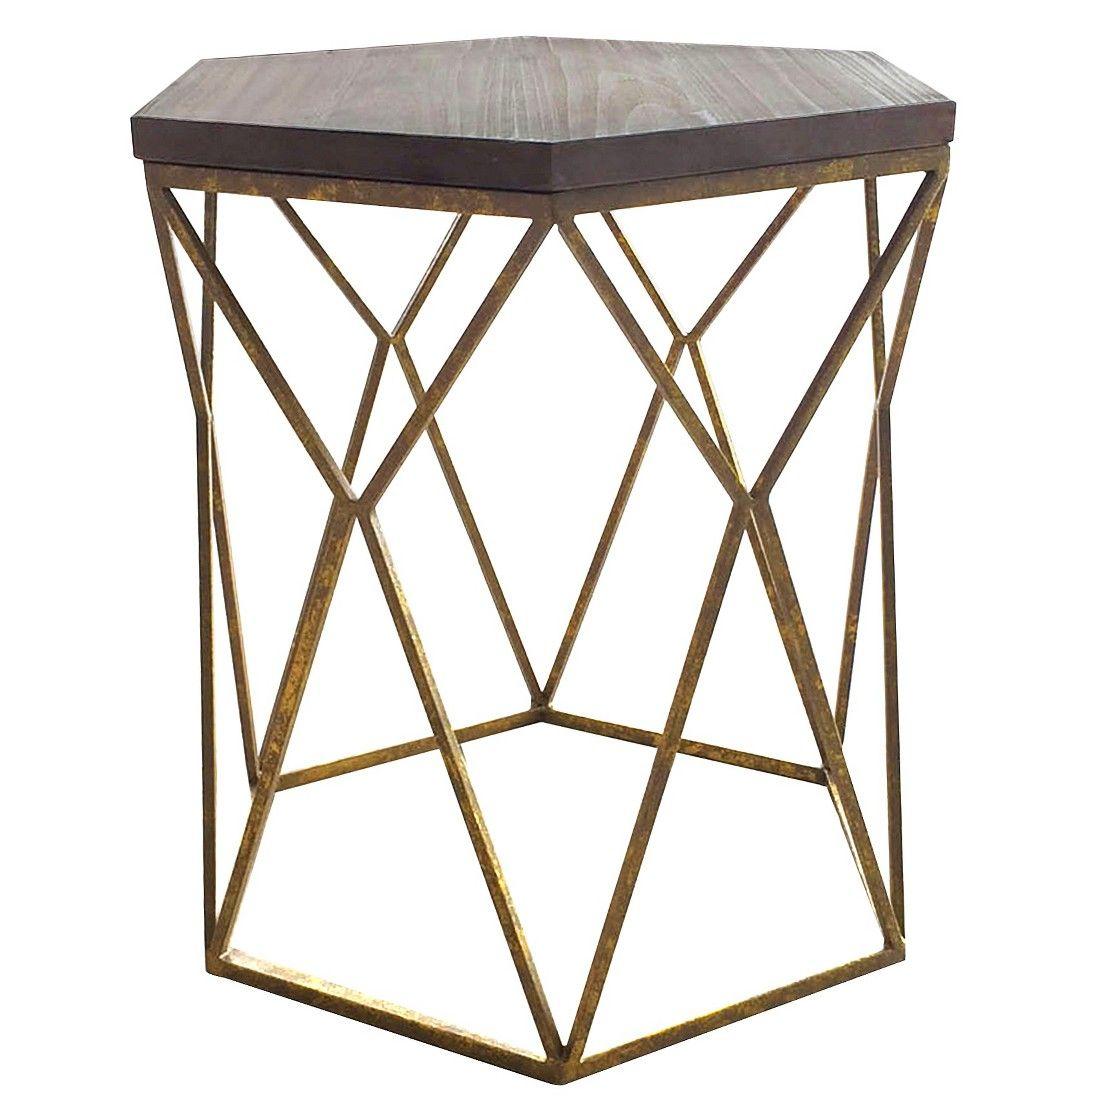 Threshold Metal Hexagon Table With Wood Top Geometric Side